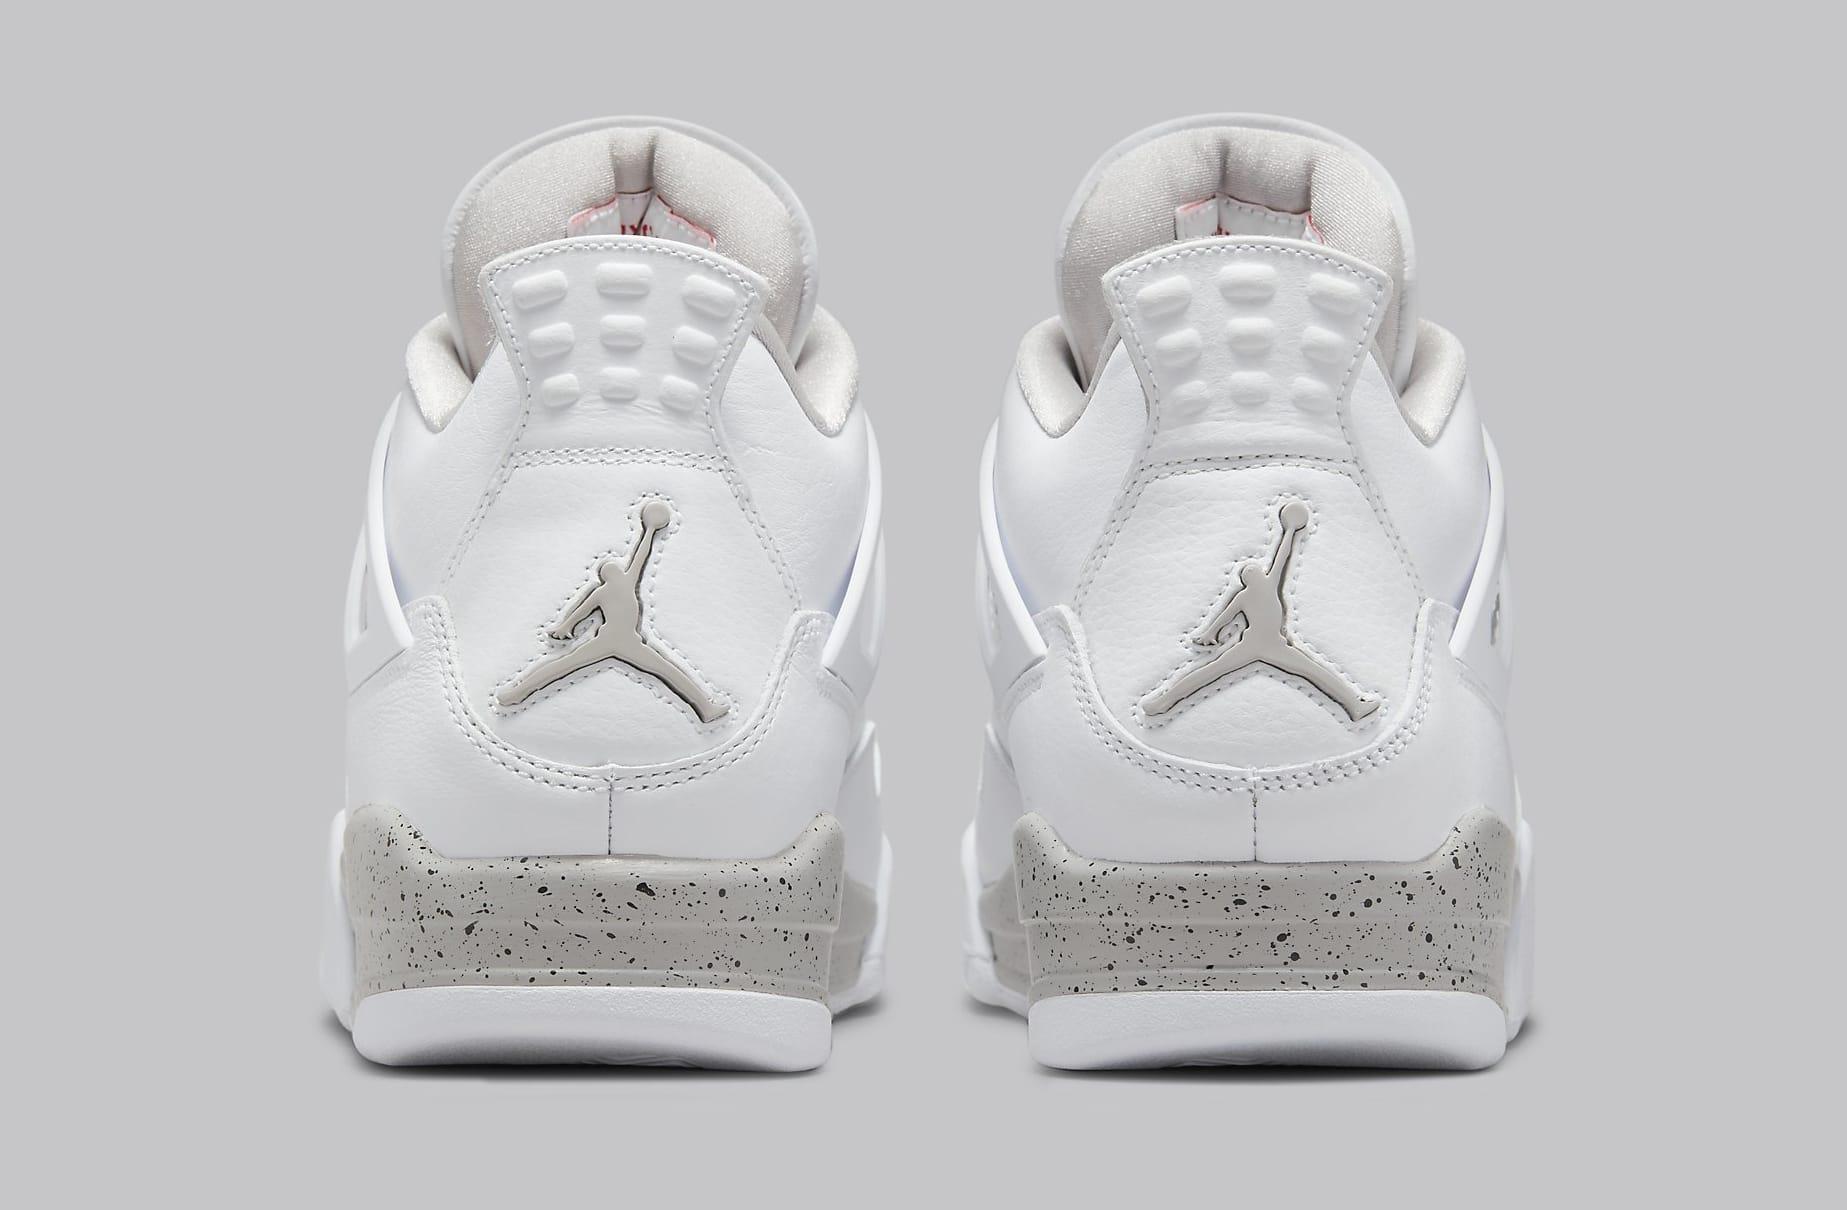 Air Jordan 4 Retro 'White Oreo' CT8527-100 Heel